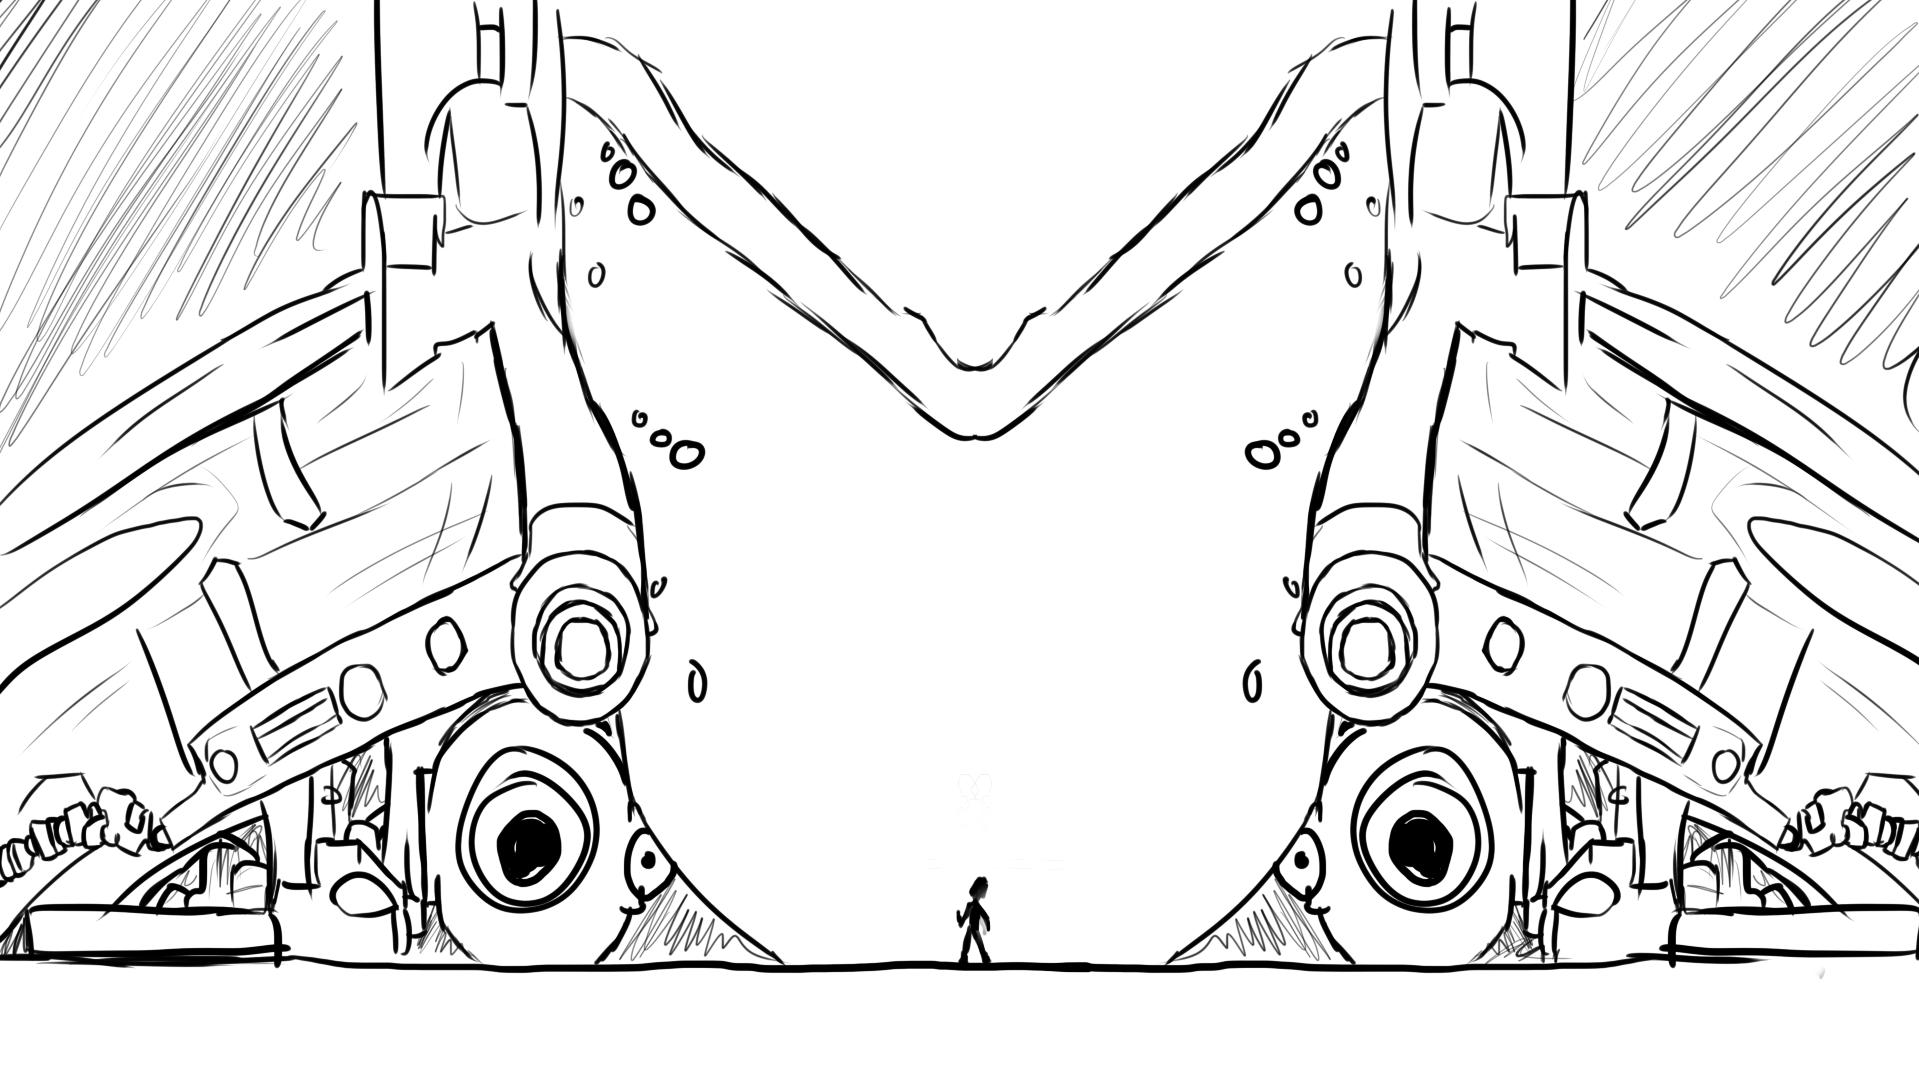 Astroboy_Wallpaper